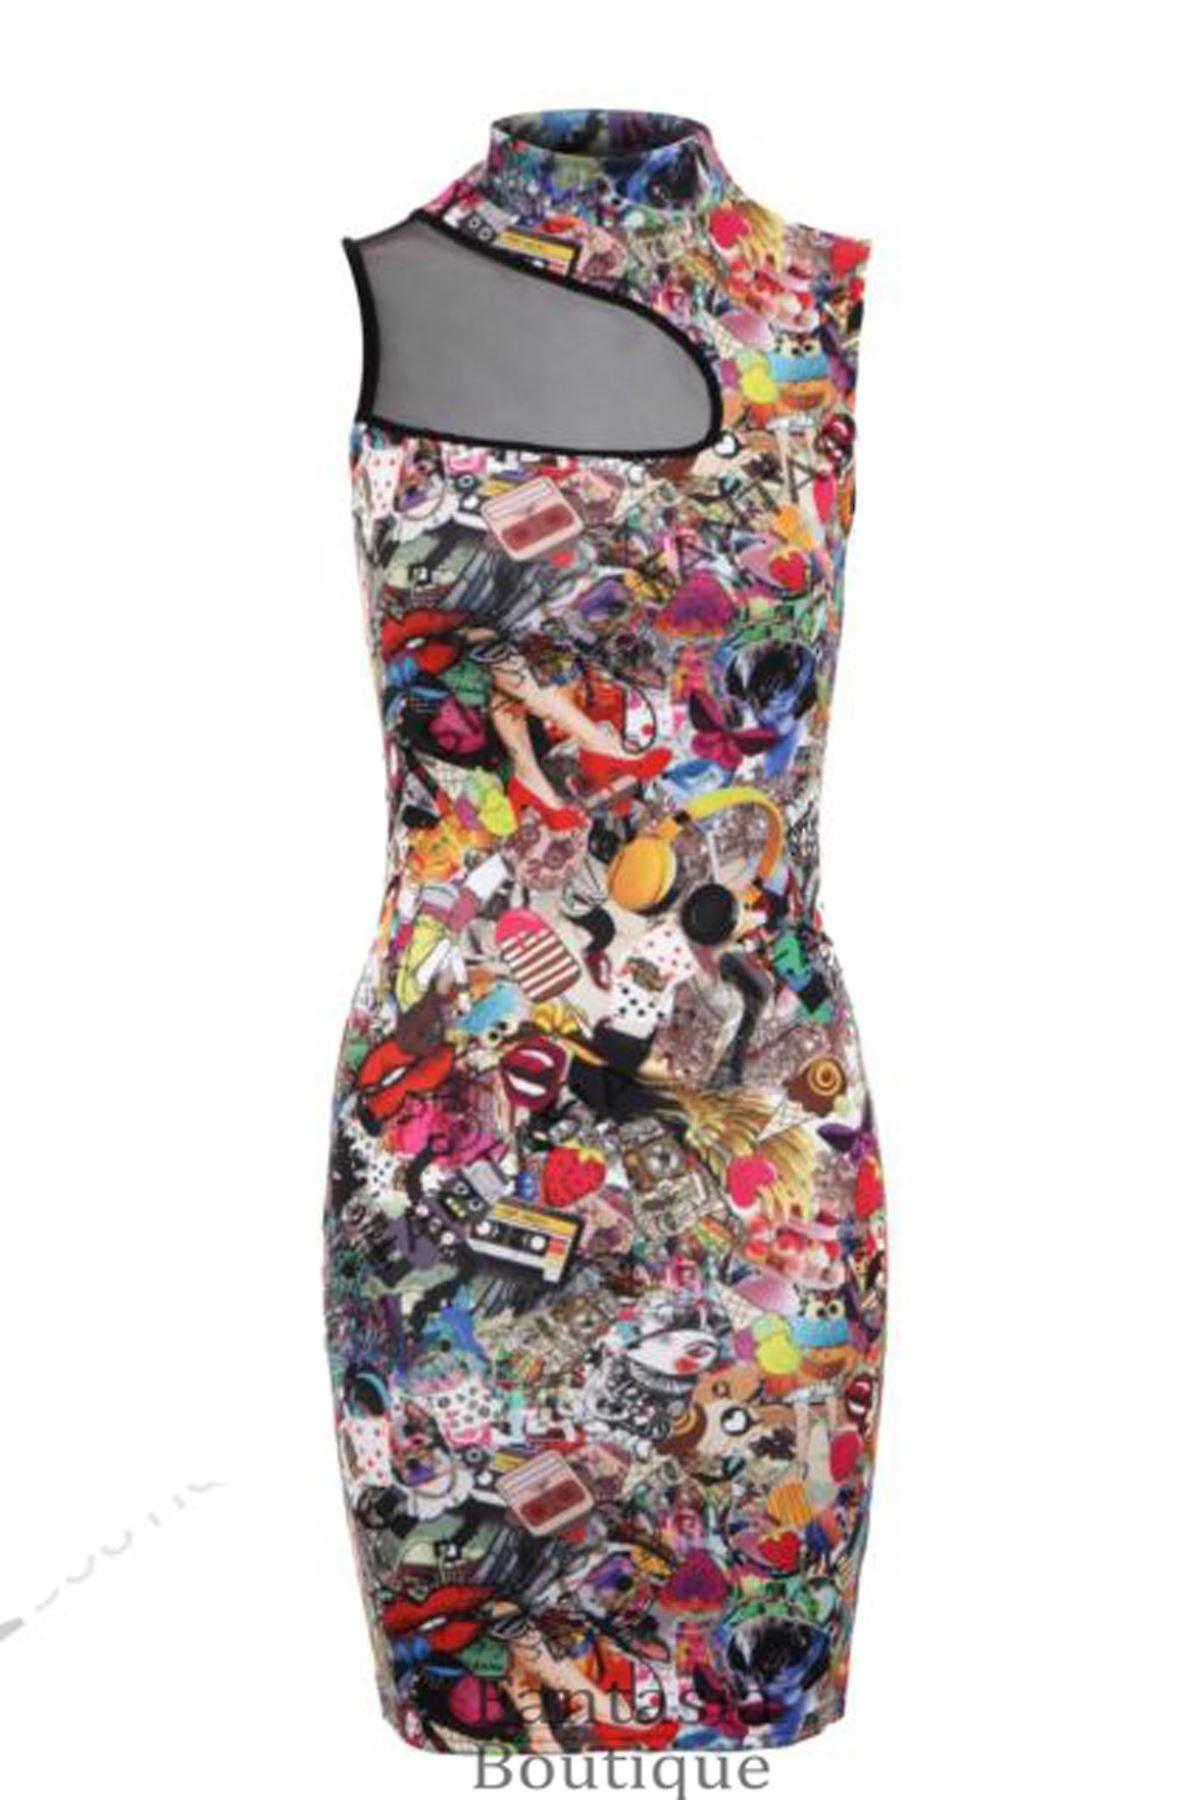 Ladies Funky Print Chest Mesh Slimming Effect Womens Bodycon Dress